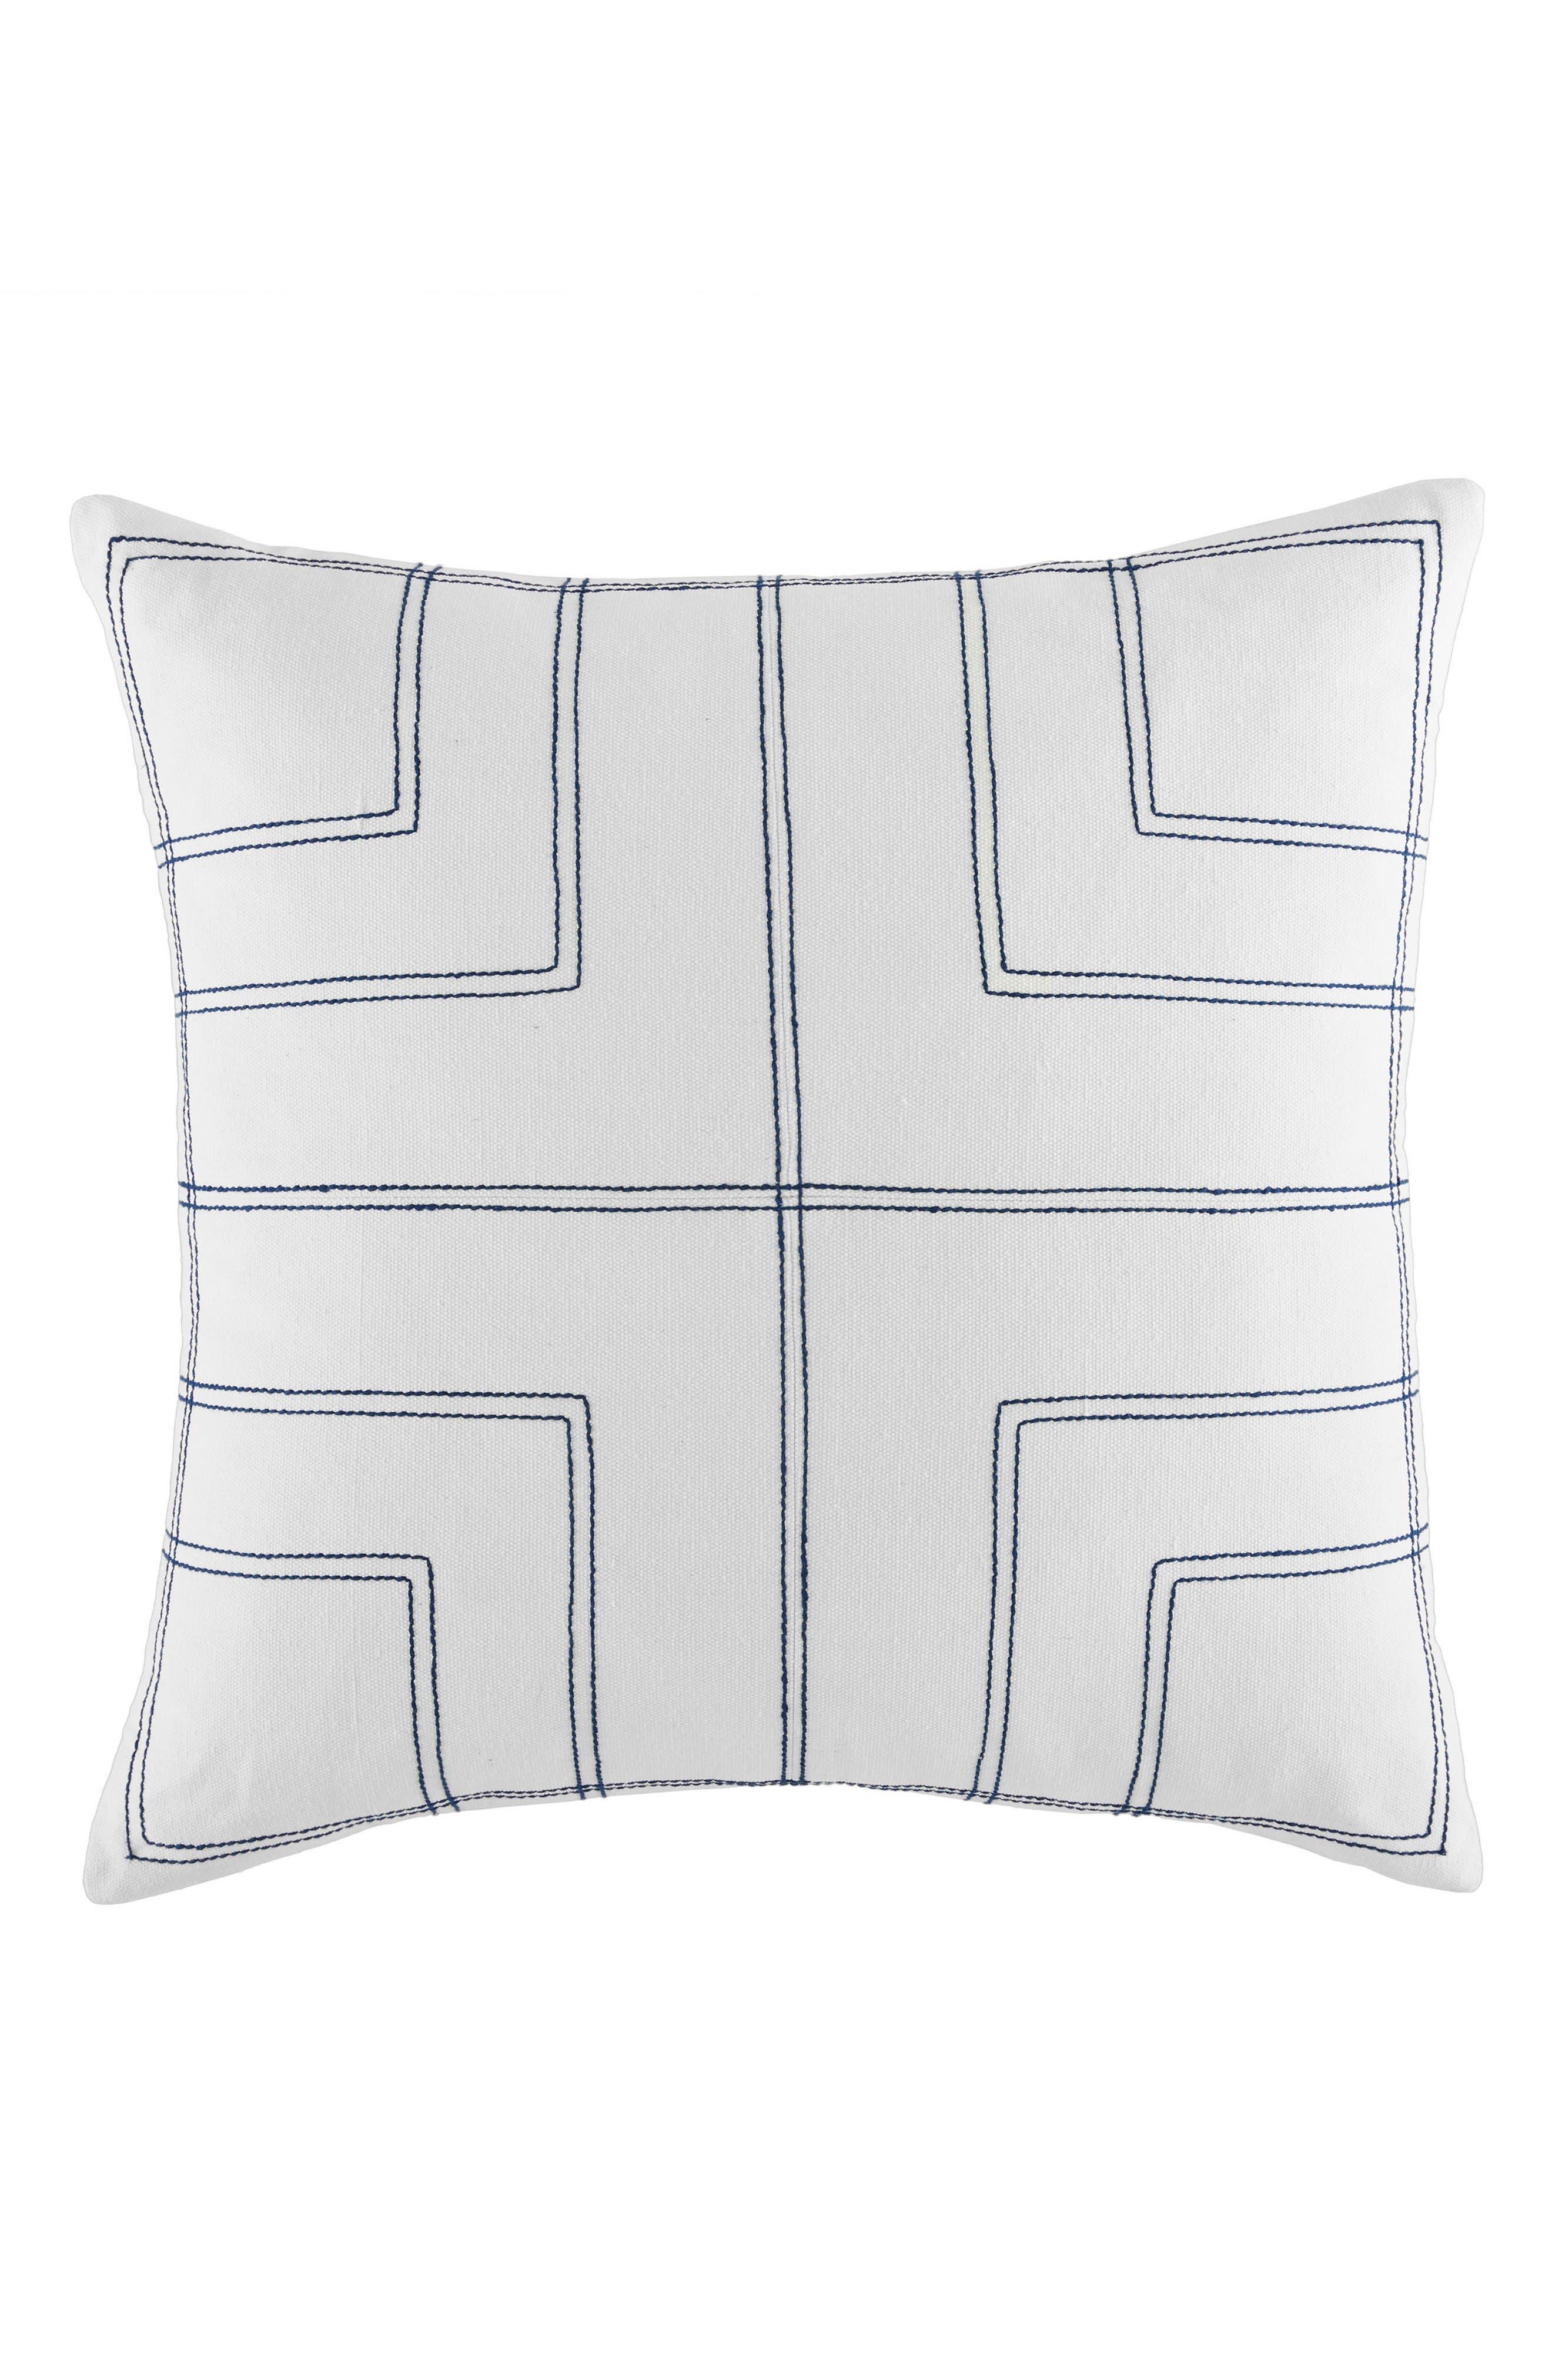 Quadrant Accent Pillow,                         Main,                         color, White